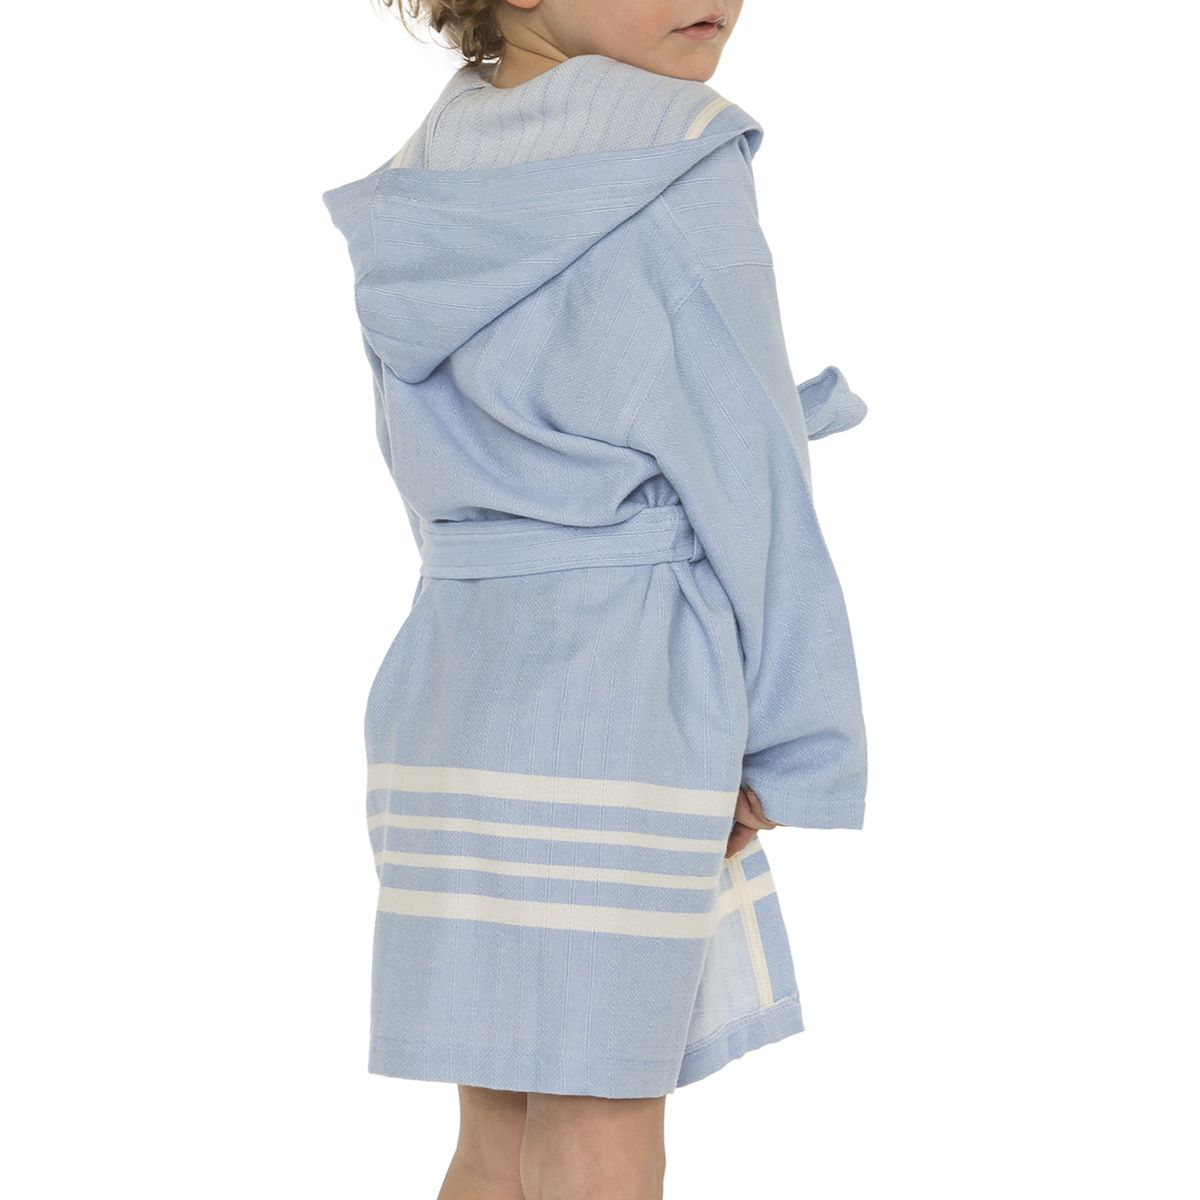 Bathrobe Kiddo with hood  - Blue